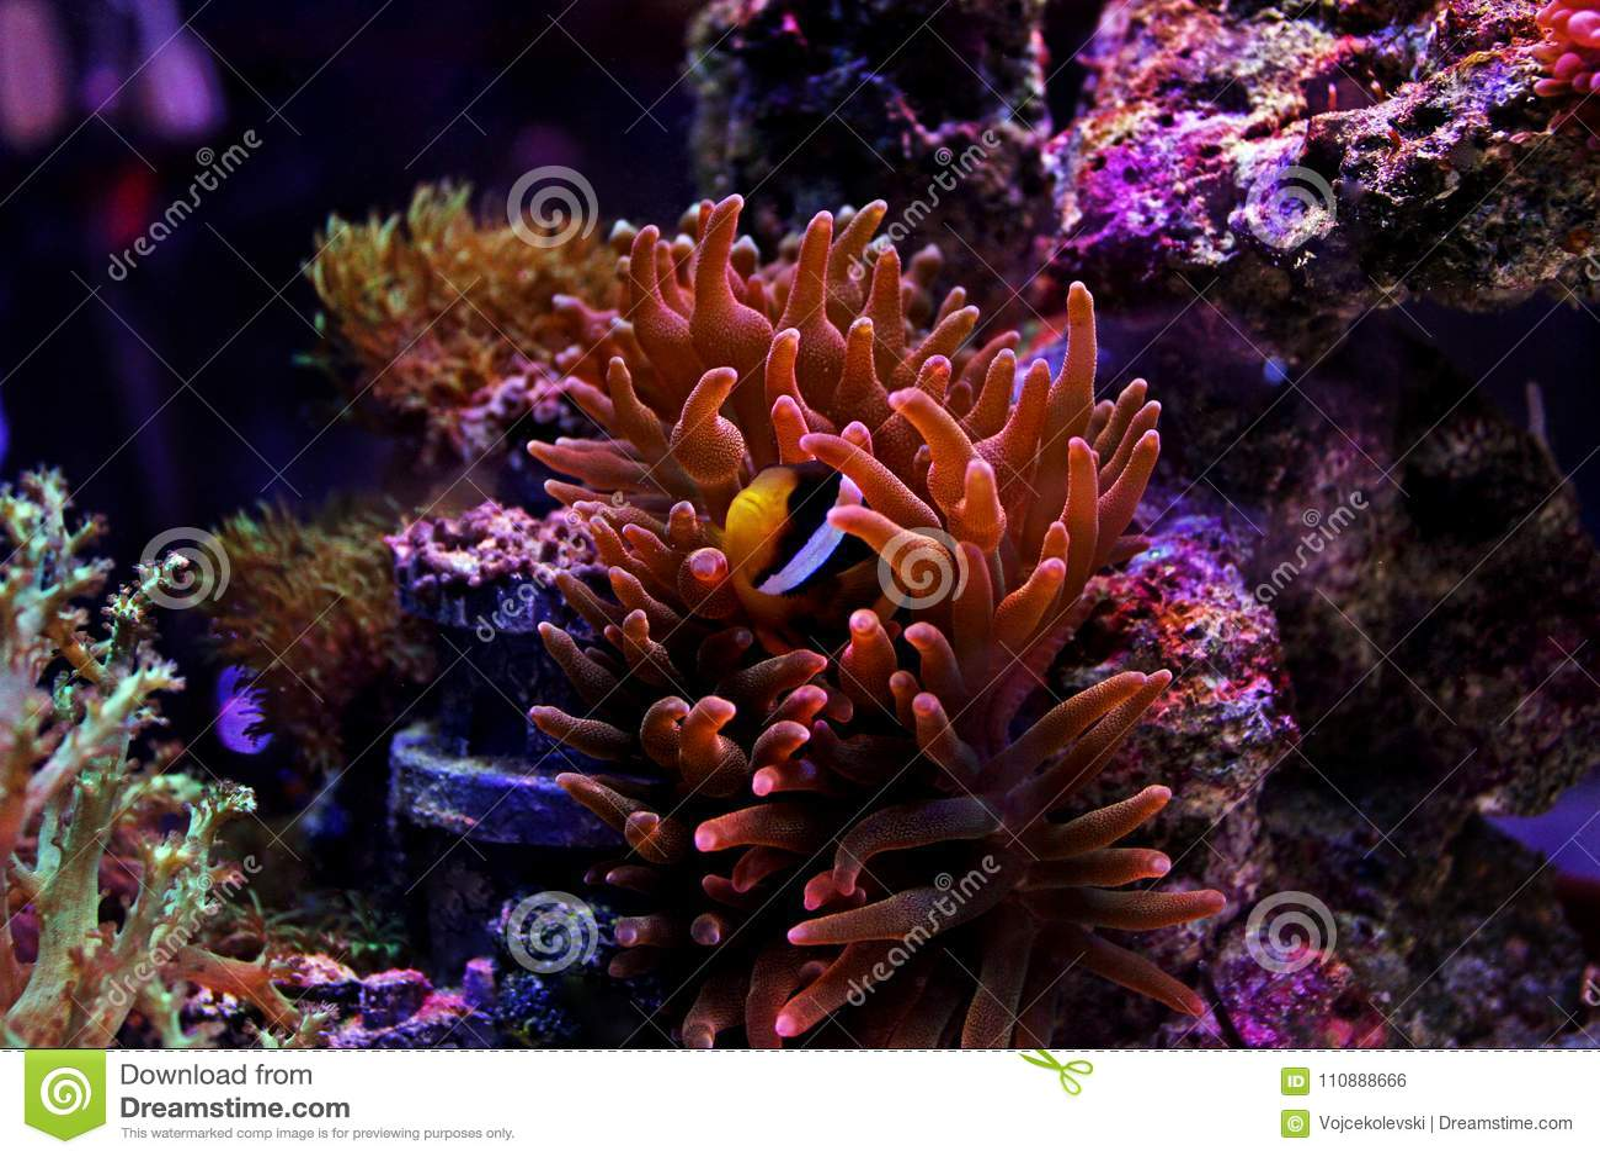 Clarkii Clownfish - Amphiprion Clarkii Stock Photo - Image of ...